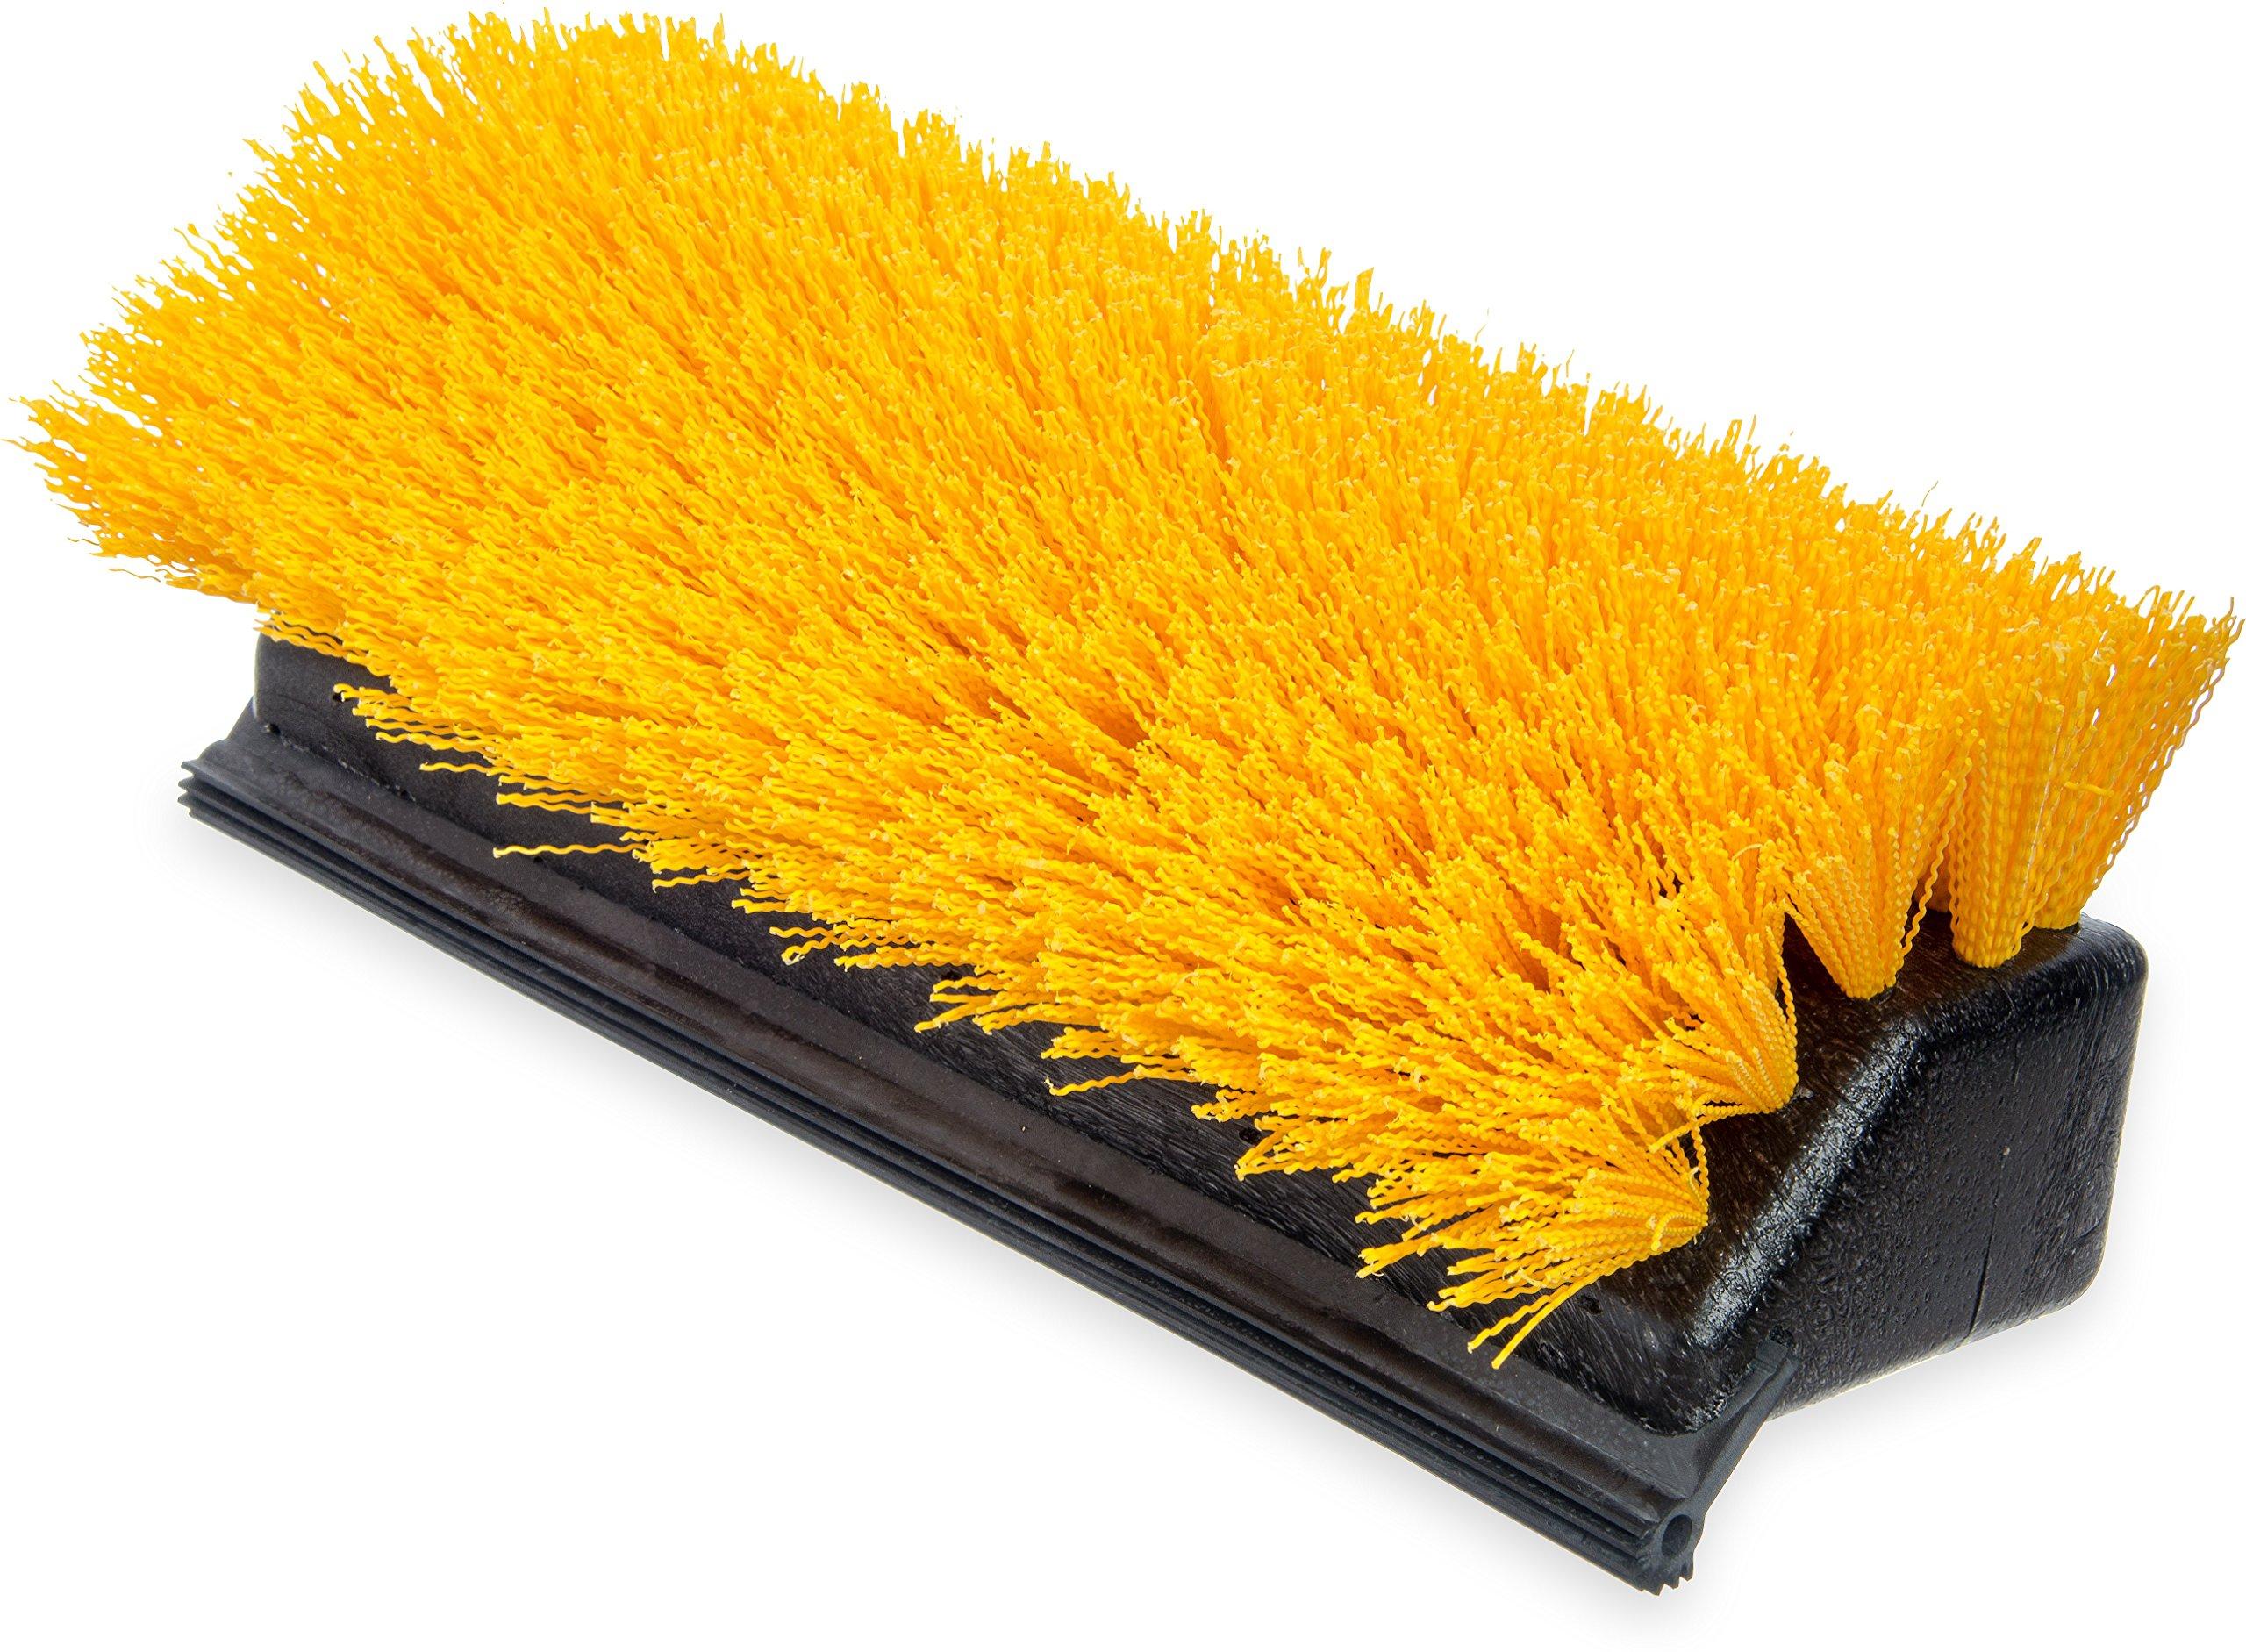 Carlisle 4042100 Plastic Block Hi-Lo Floor Scrub Brush with Squeegee, Polypropylene Bristles, 10'' Length x 4-1/2'' Width Block